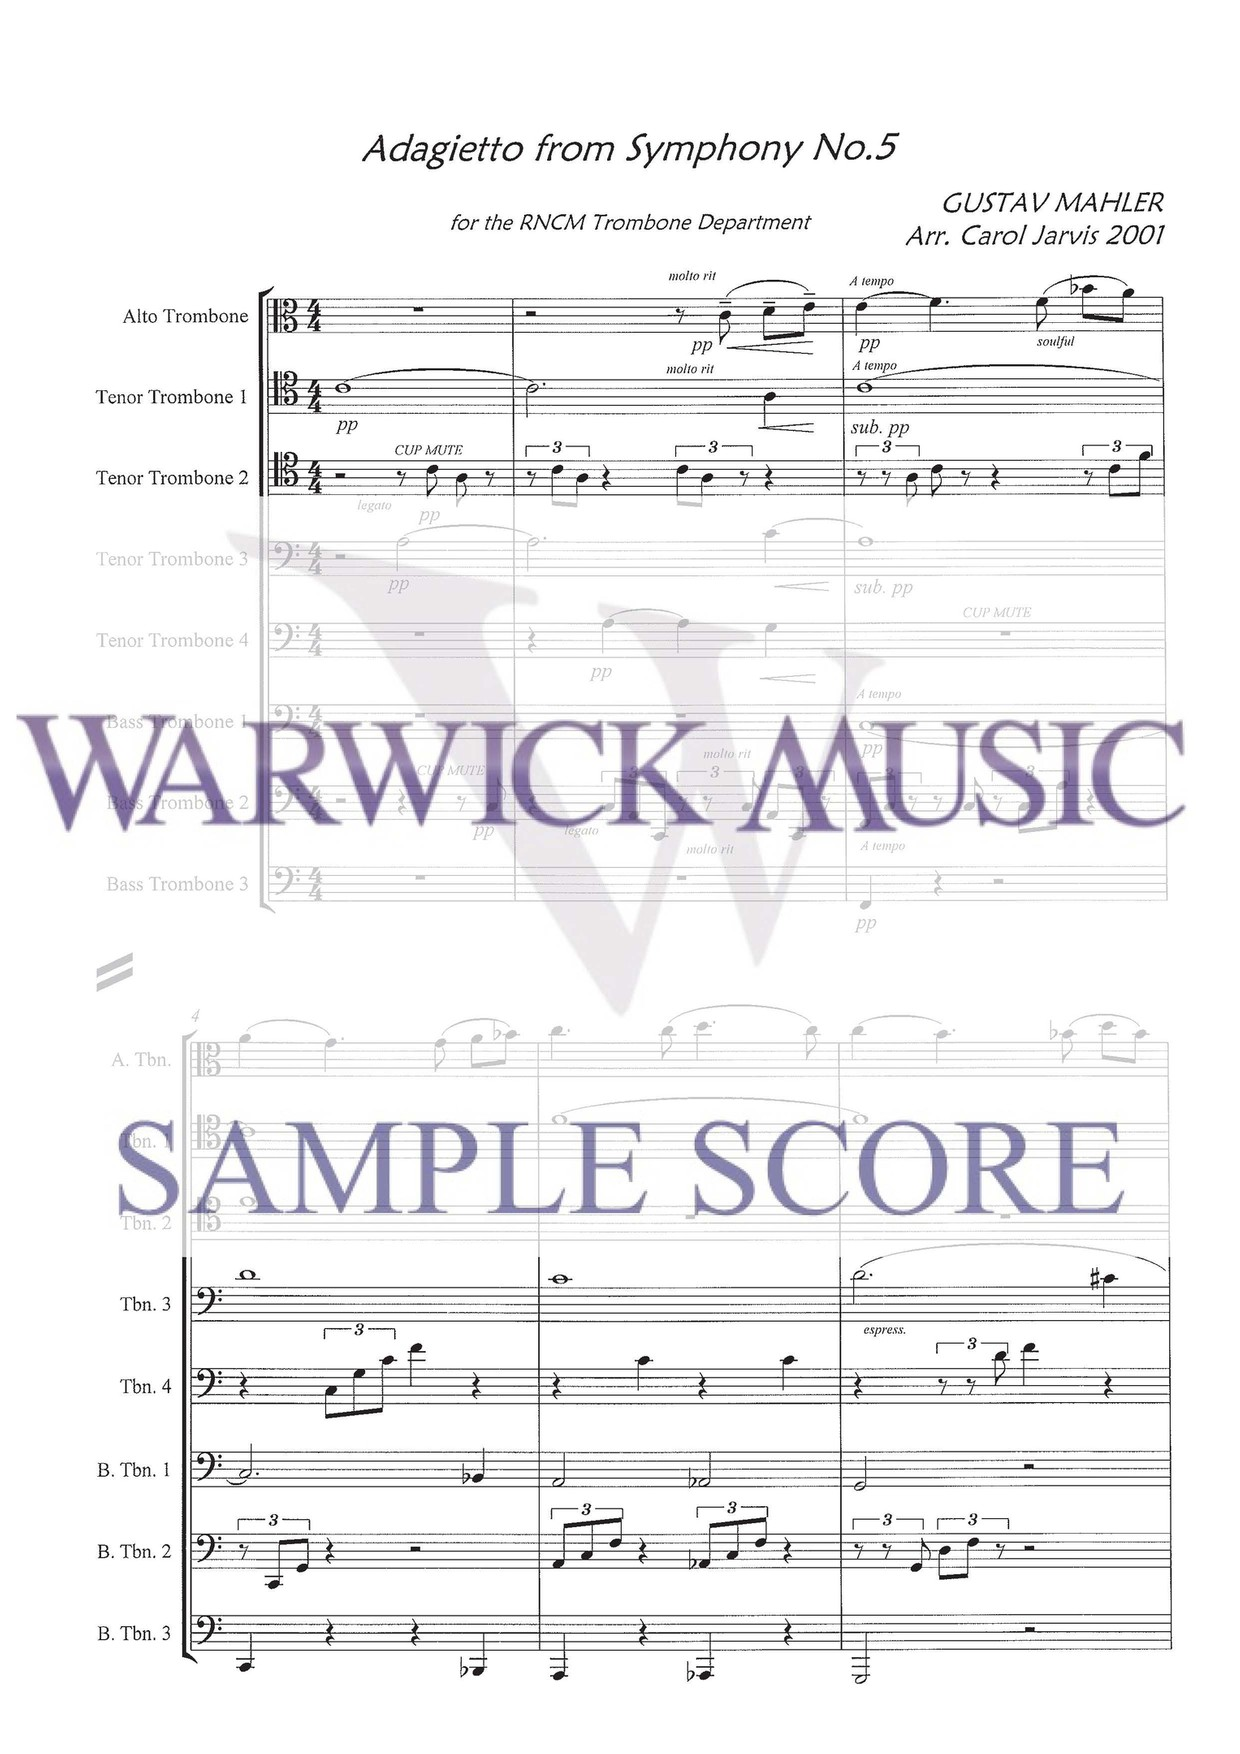 5Th Symphony mahler arr. carol jarvis: adagietto from mahler 5th symphony - trombone  octet